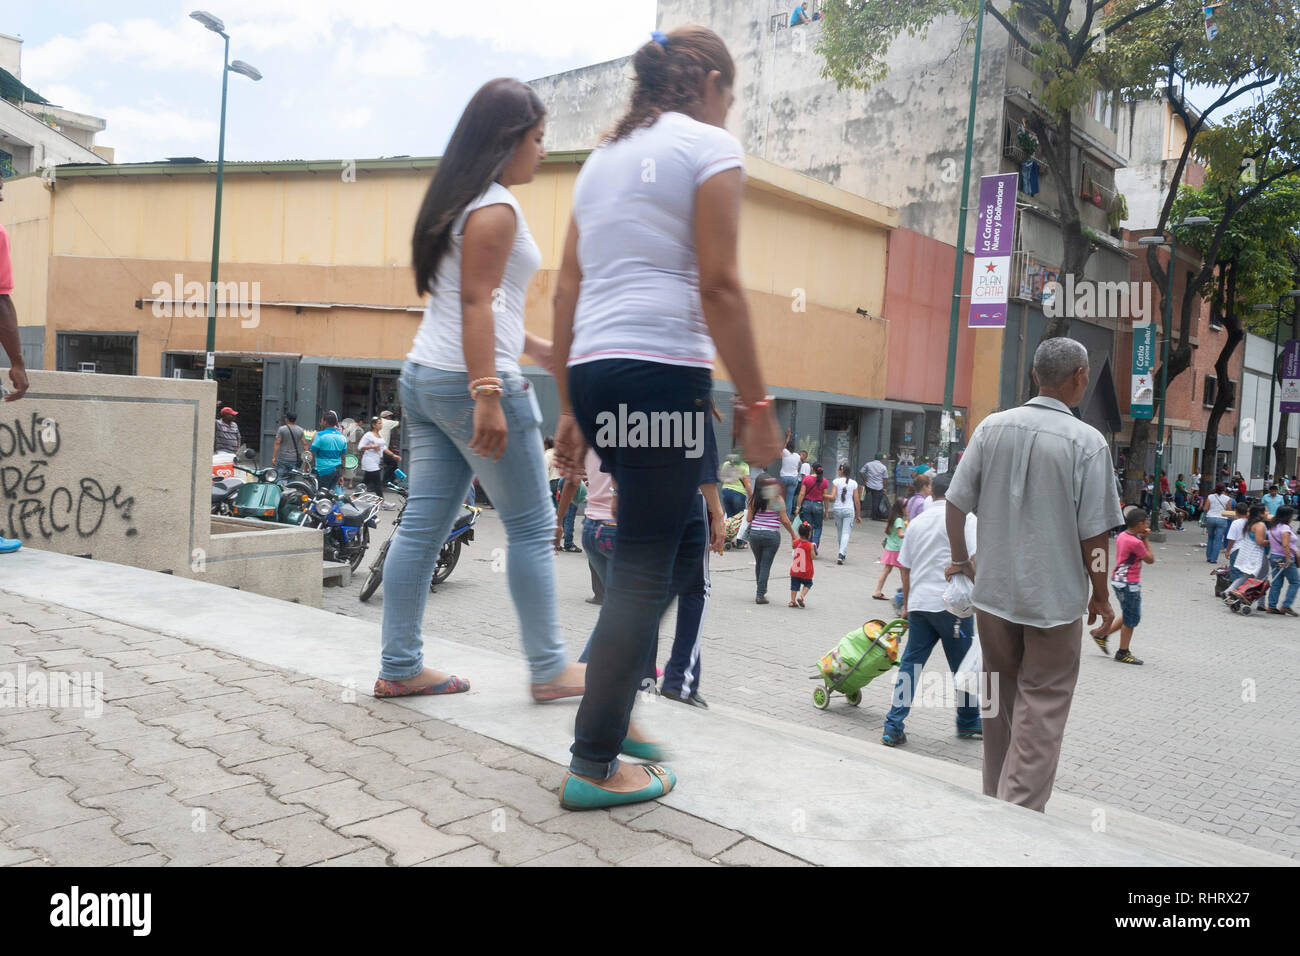 Caracas, Dtto Capital / Venezuela - 03/05/2013. People walking on the boulevard of Catia. - Stock Image